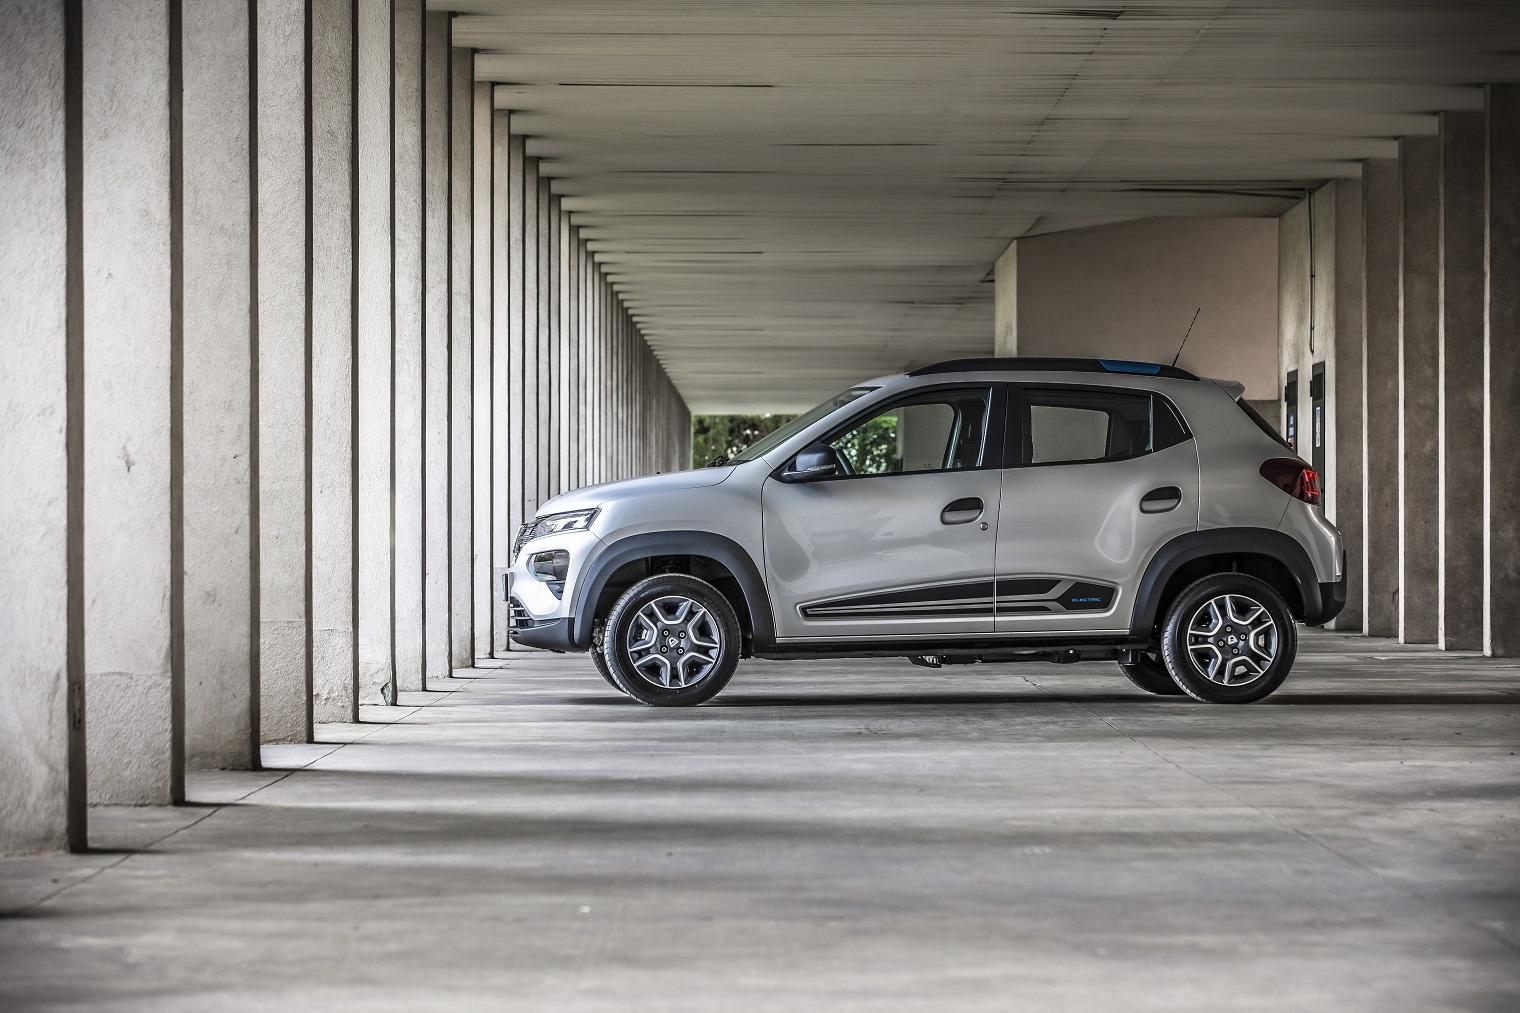 Esterni nuova Dacia Spring